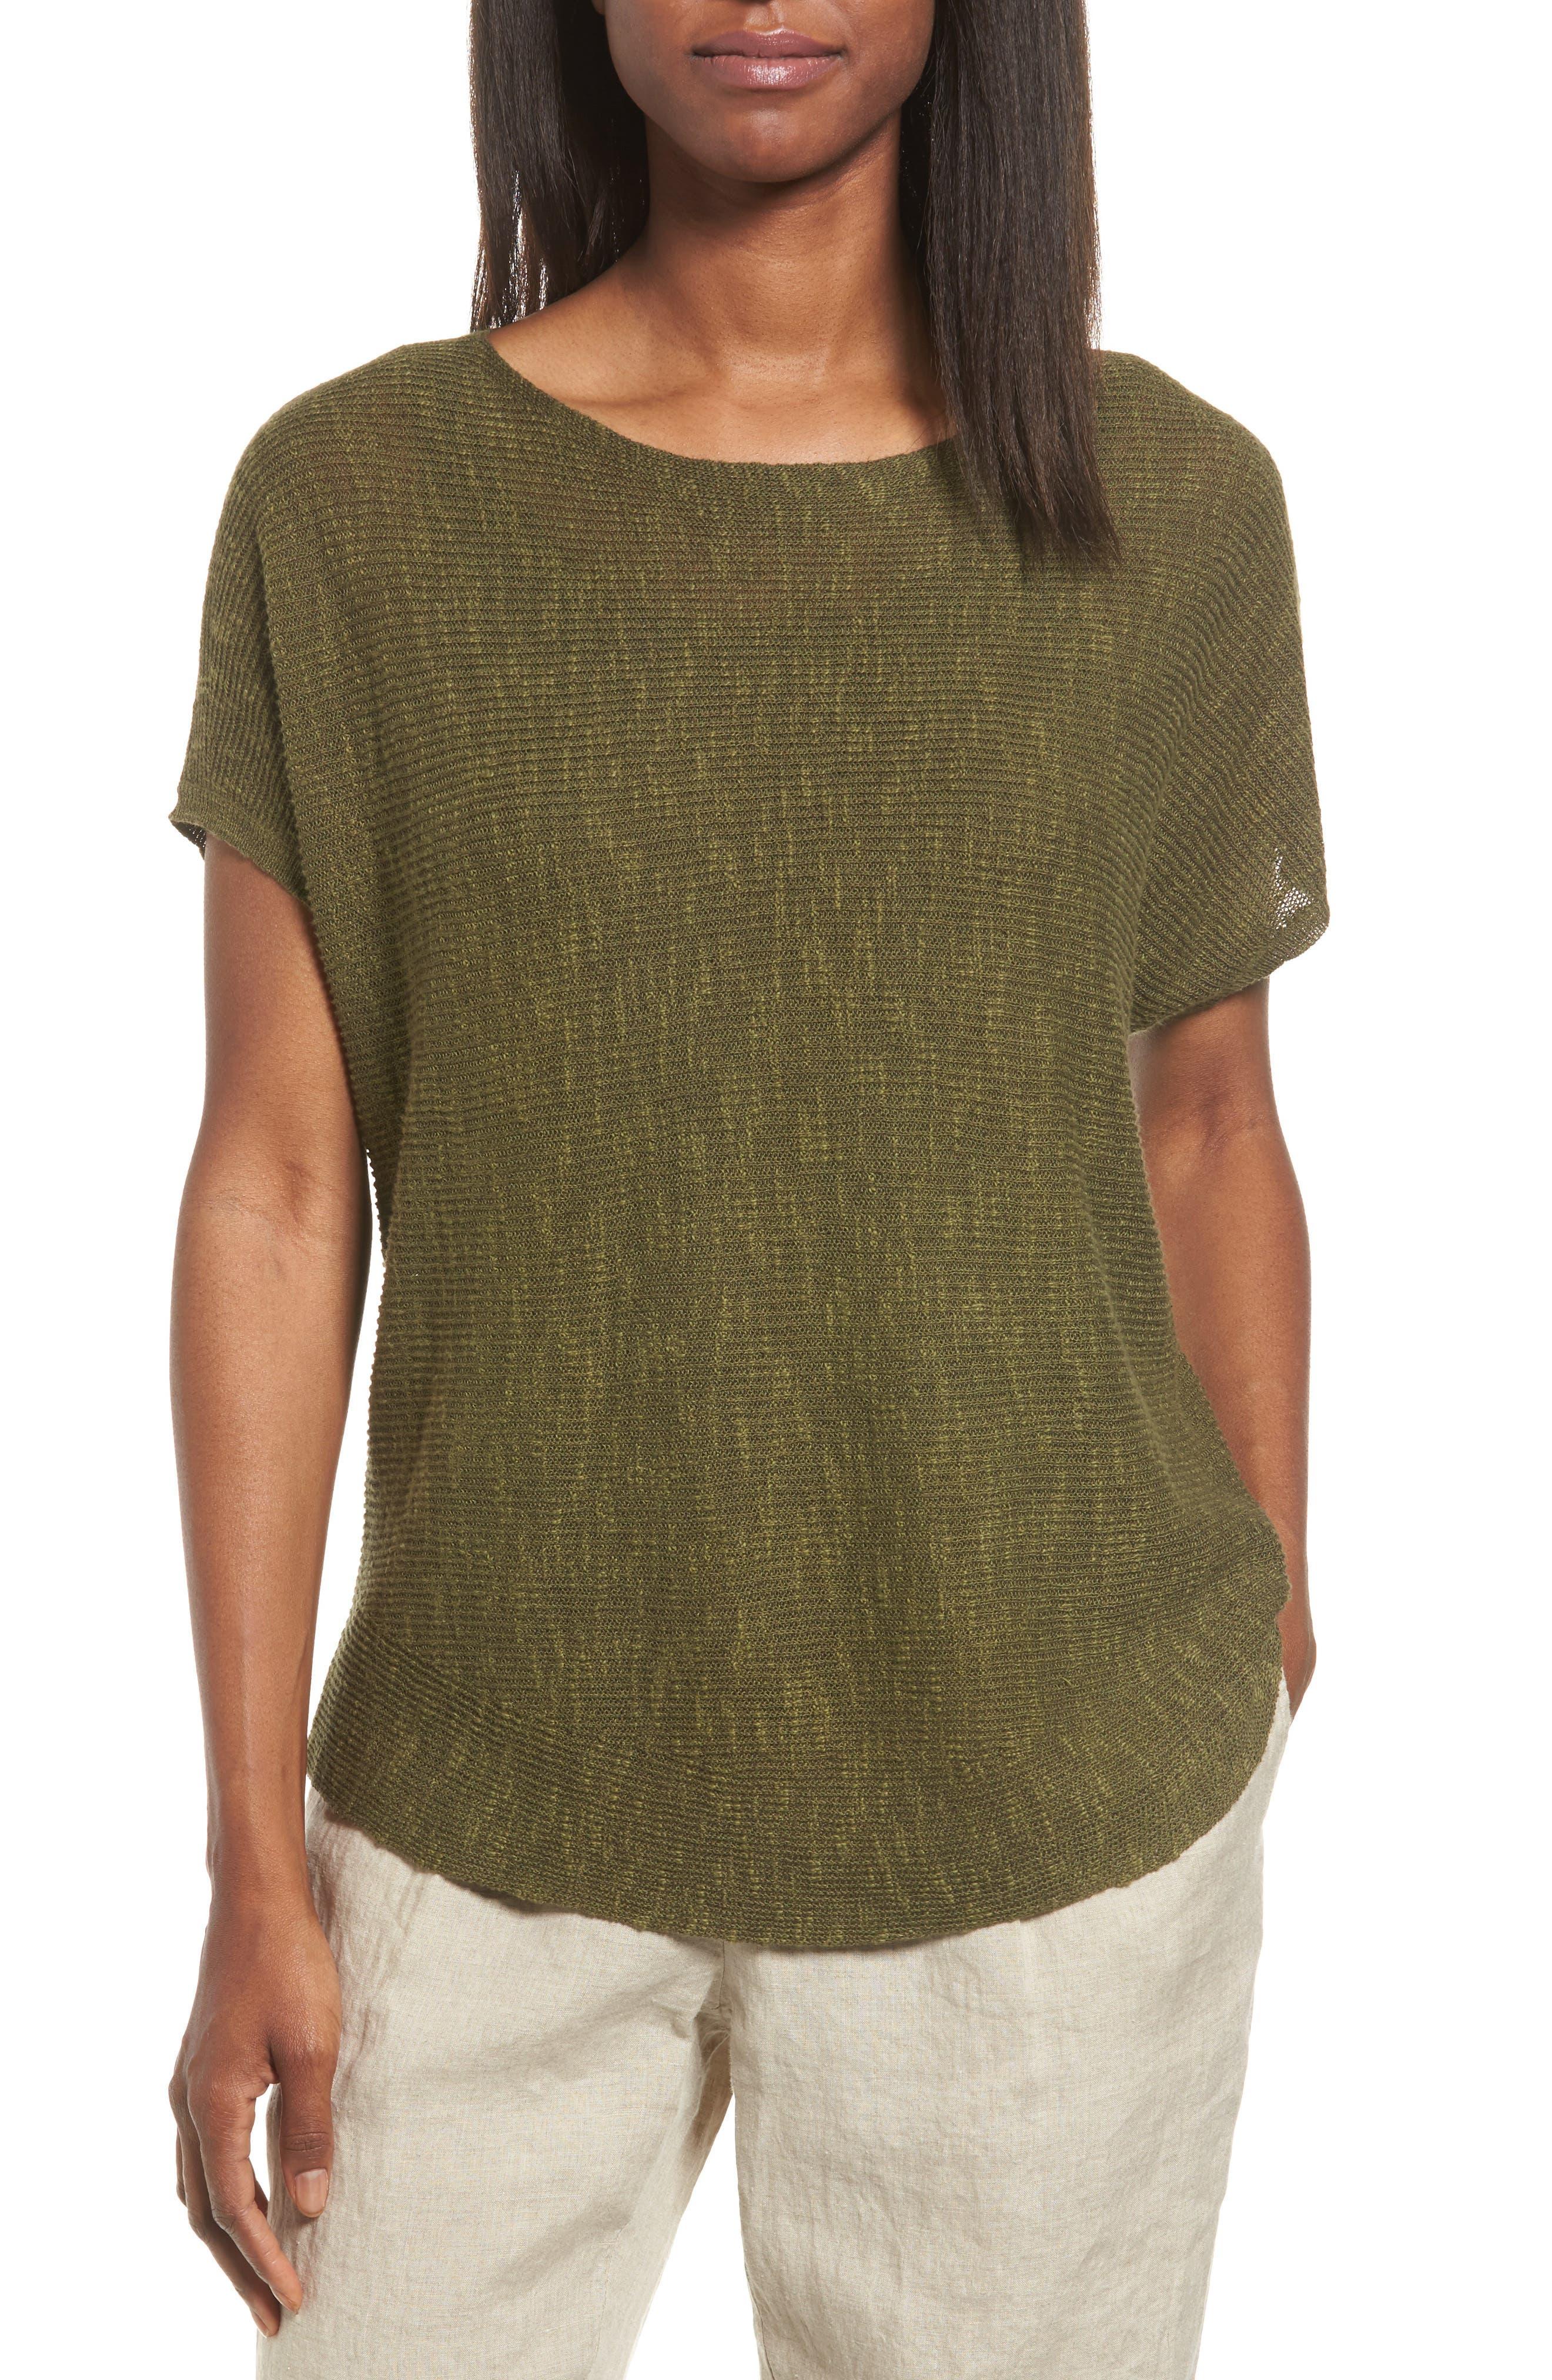 Alternate Image 1 Selected - Eileen Fisher Organic Linen & Cotton Knit Top (Regular & Petite)